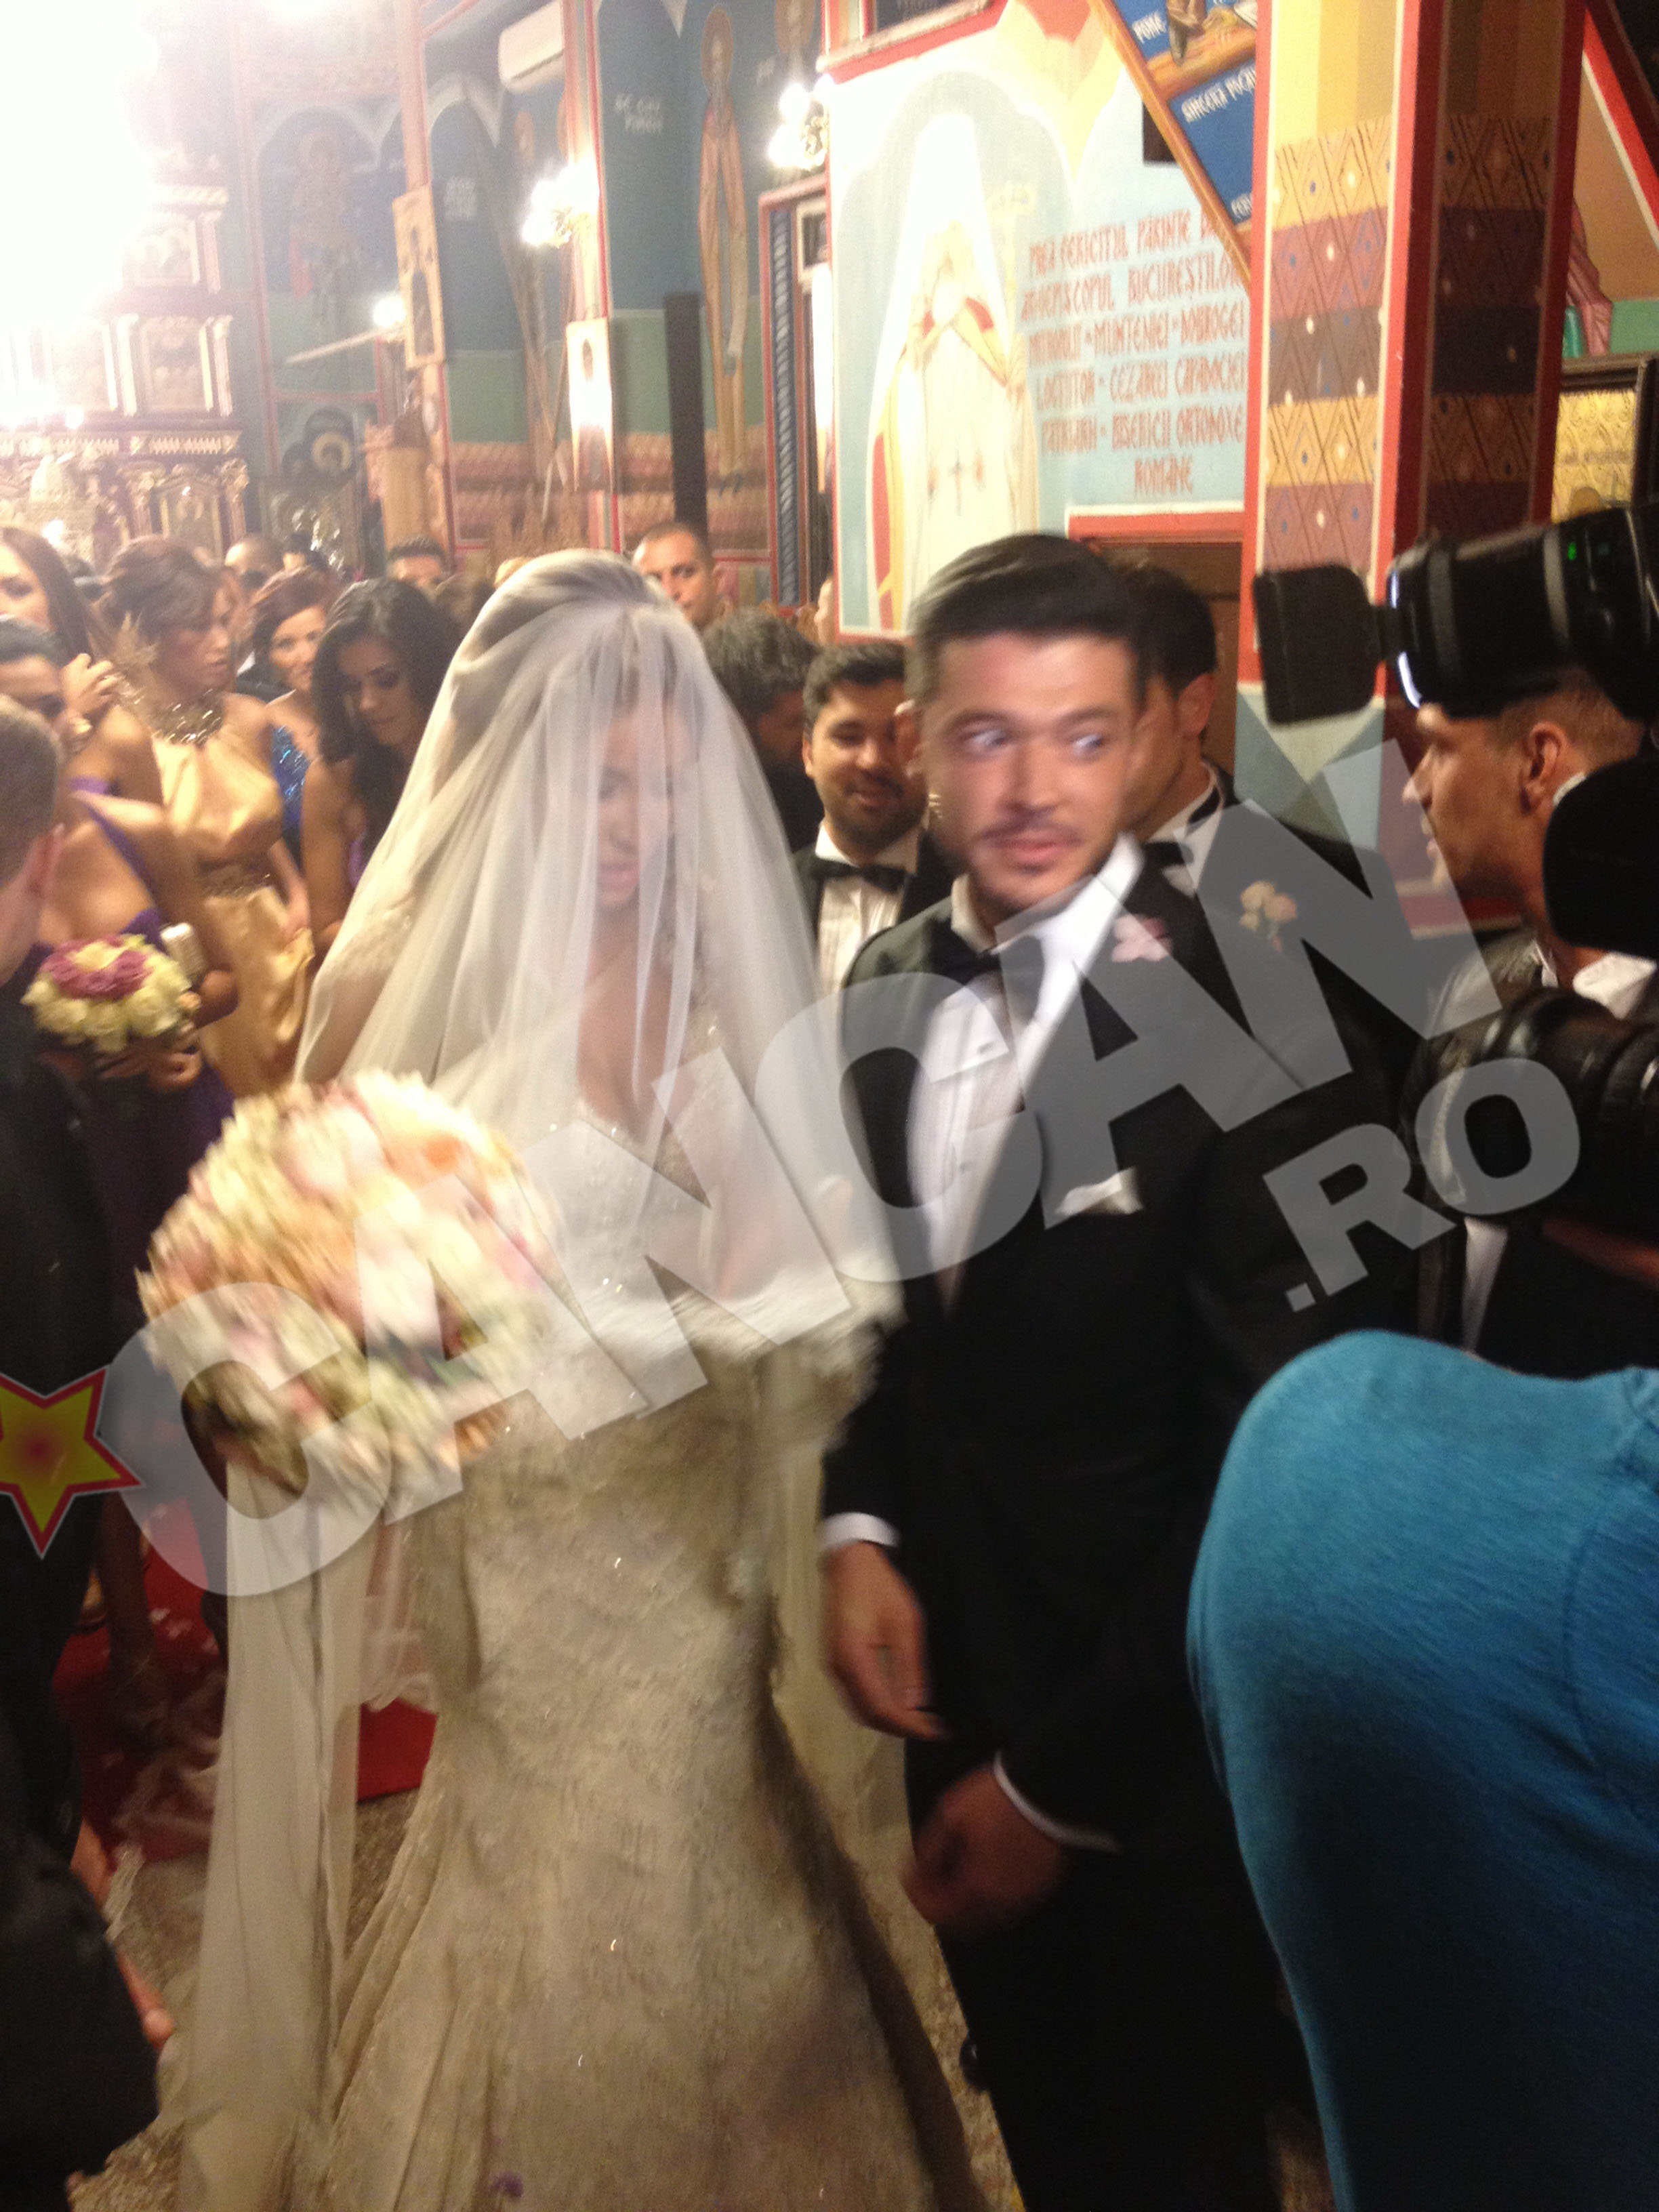 Duminica, Victor Slav a condus-o pe Bianca la altar